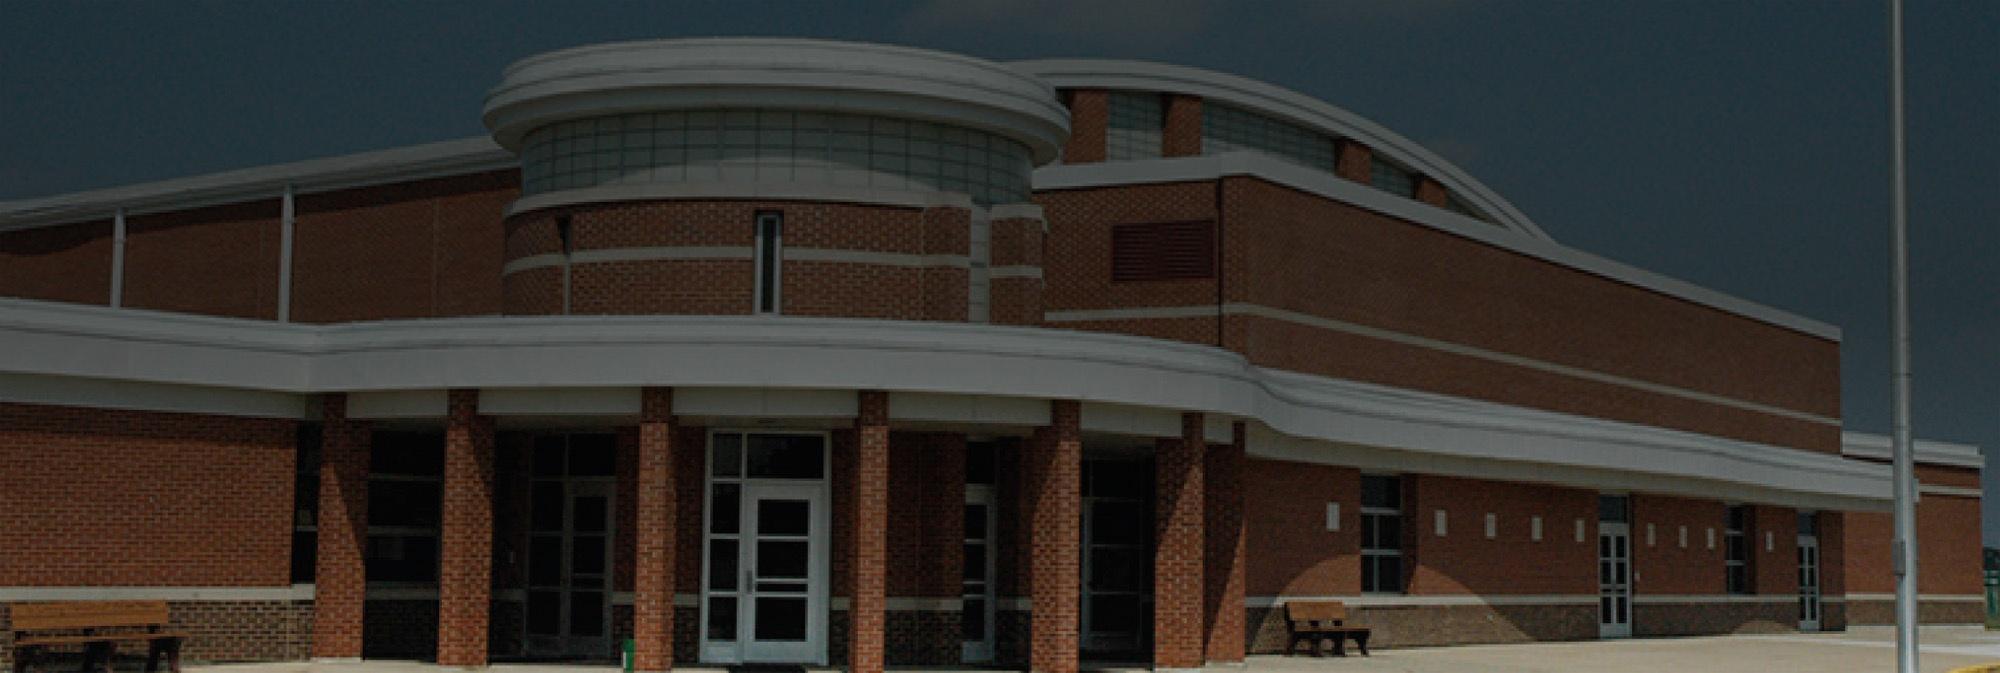 Fremont-school-district-case-study-Landing_Page-2 copy.jpg